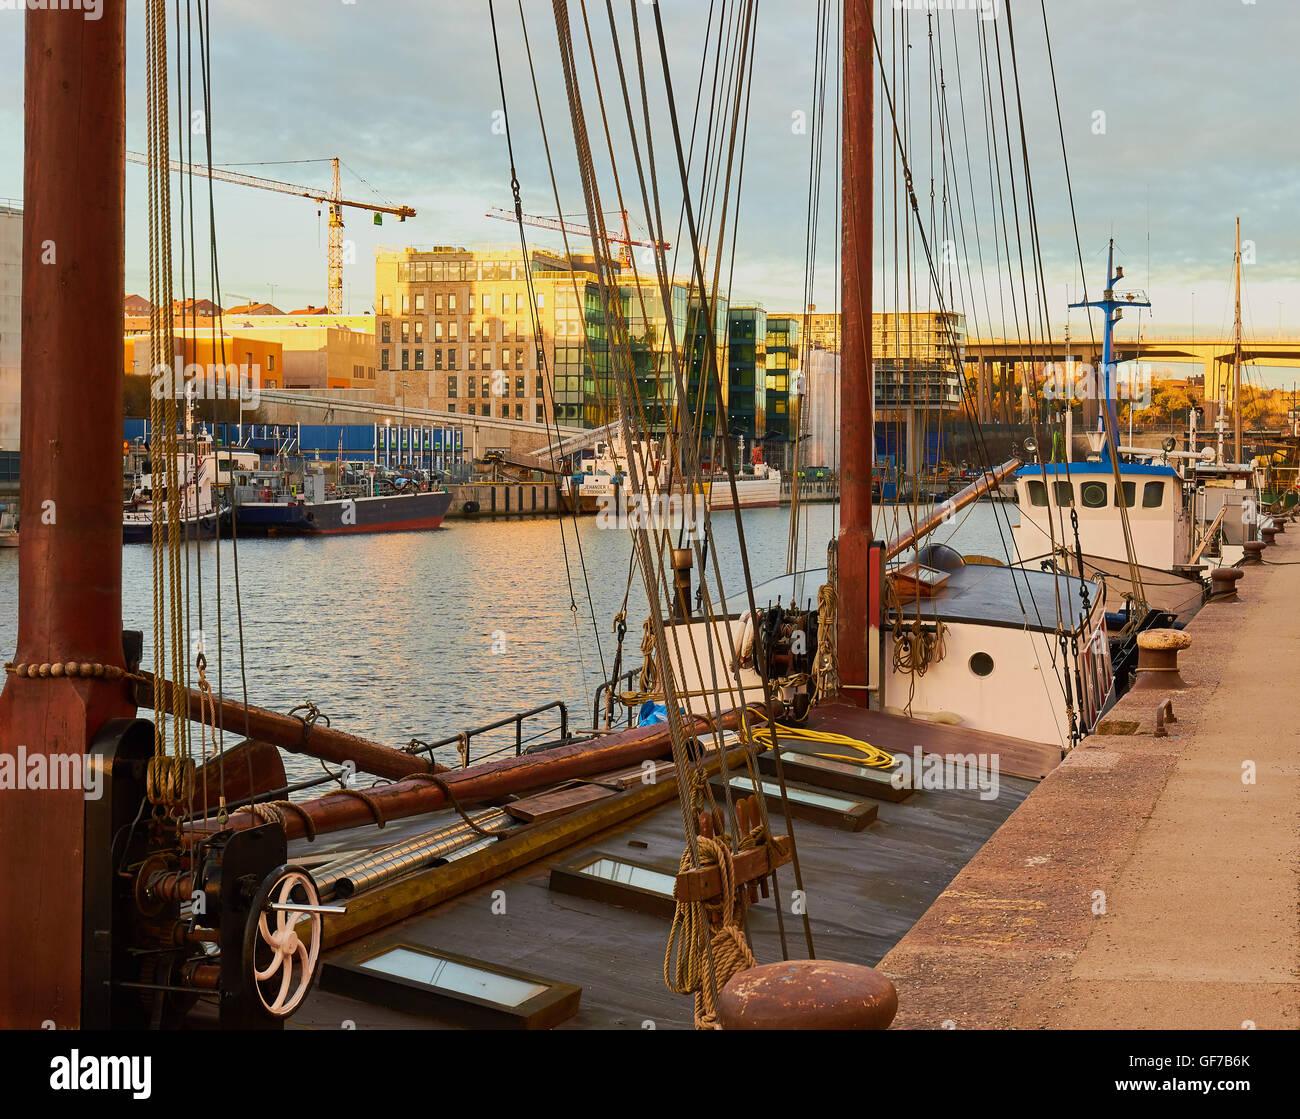 Boats moored at Hammarby Sjostad an eco neighbourhood, Stockholm, Sweden, Scandinavia - Stock Image